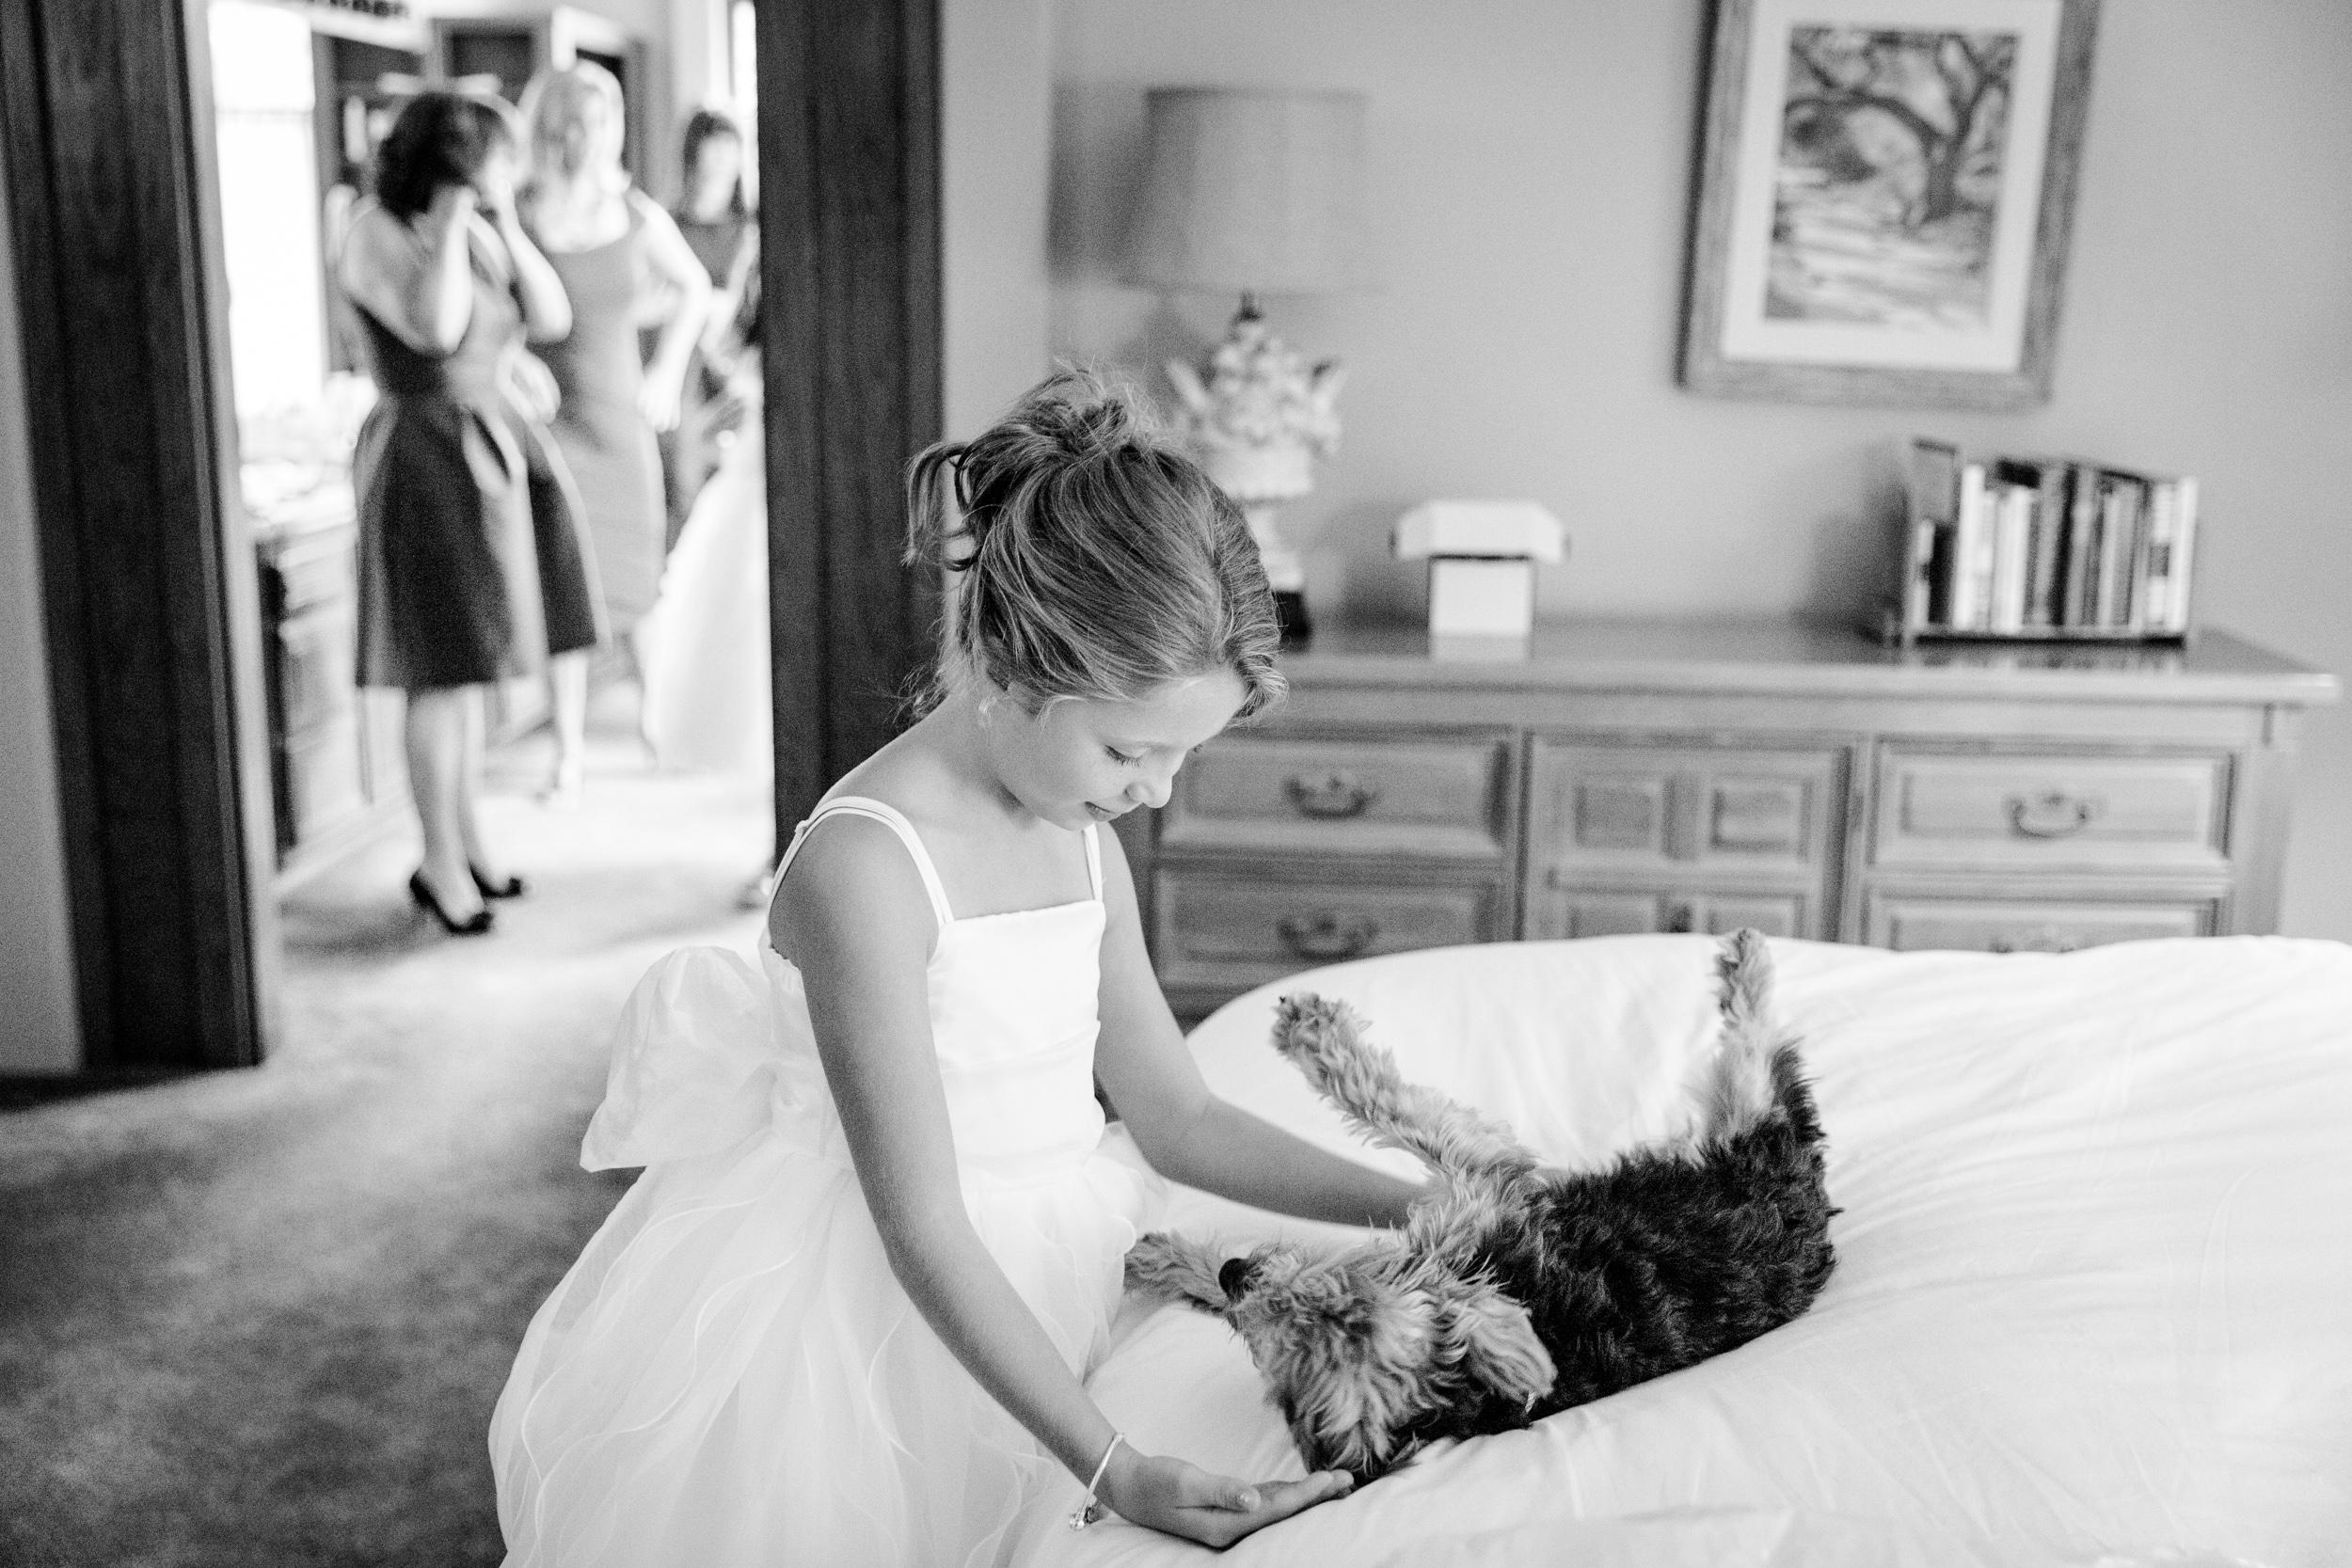 49--jewel-maree-photography-wedding.jpg